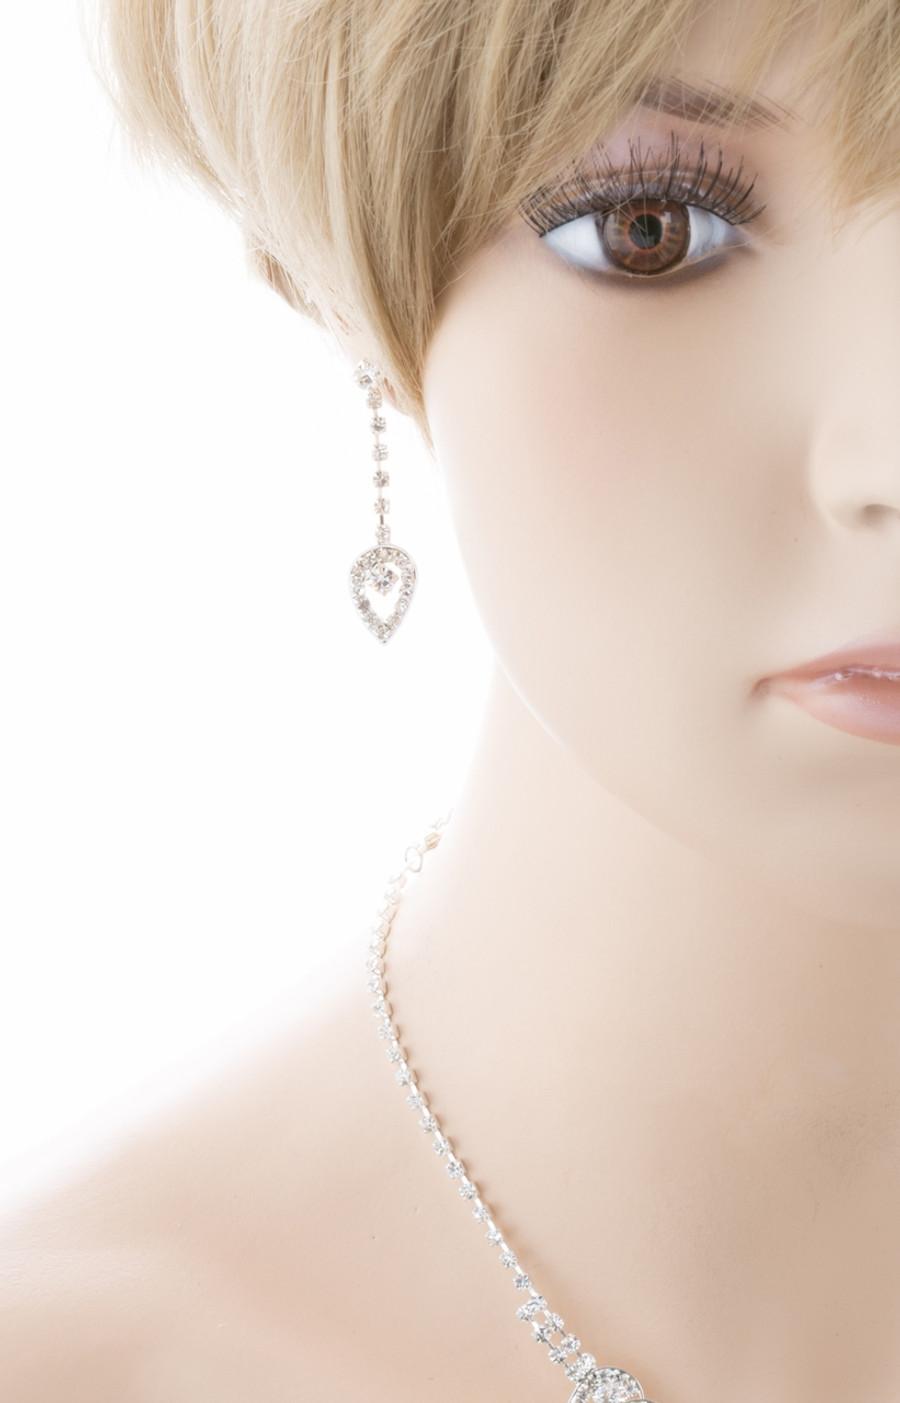 Bridal Wedding Jewelry Set Prom Crystal Rhinestone Dazzling Necklace J464 SV